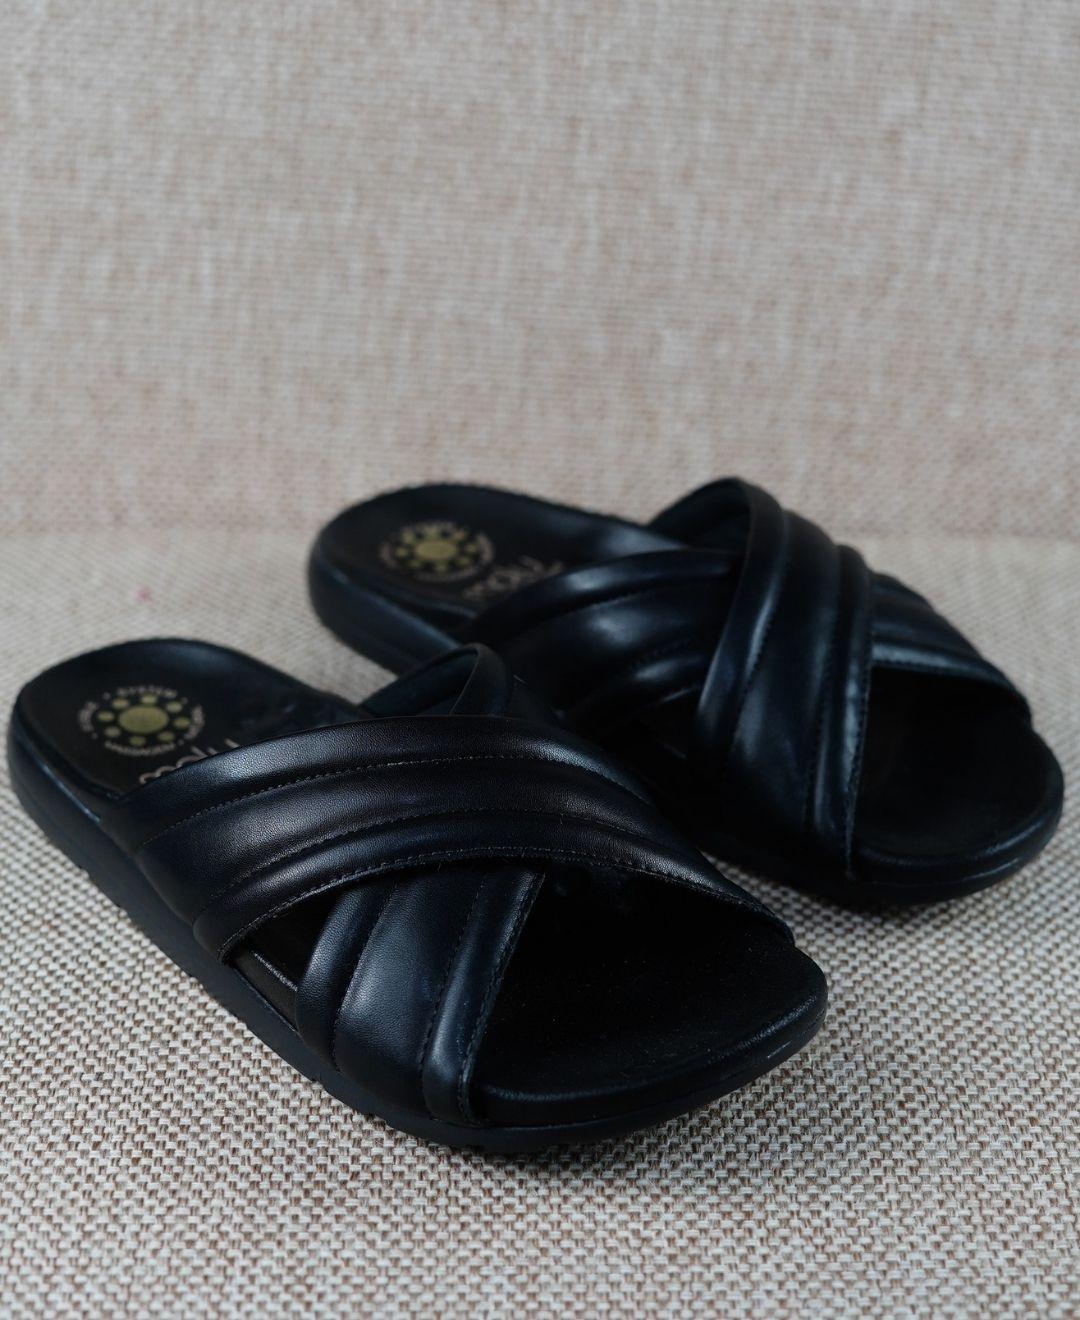 Birken Malu Super Comfort  Aria Preta v22-10062